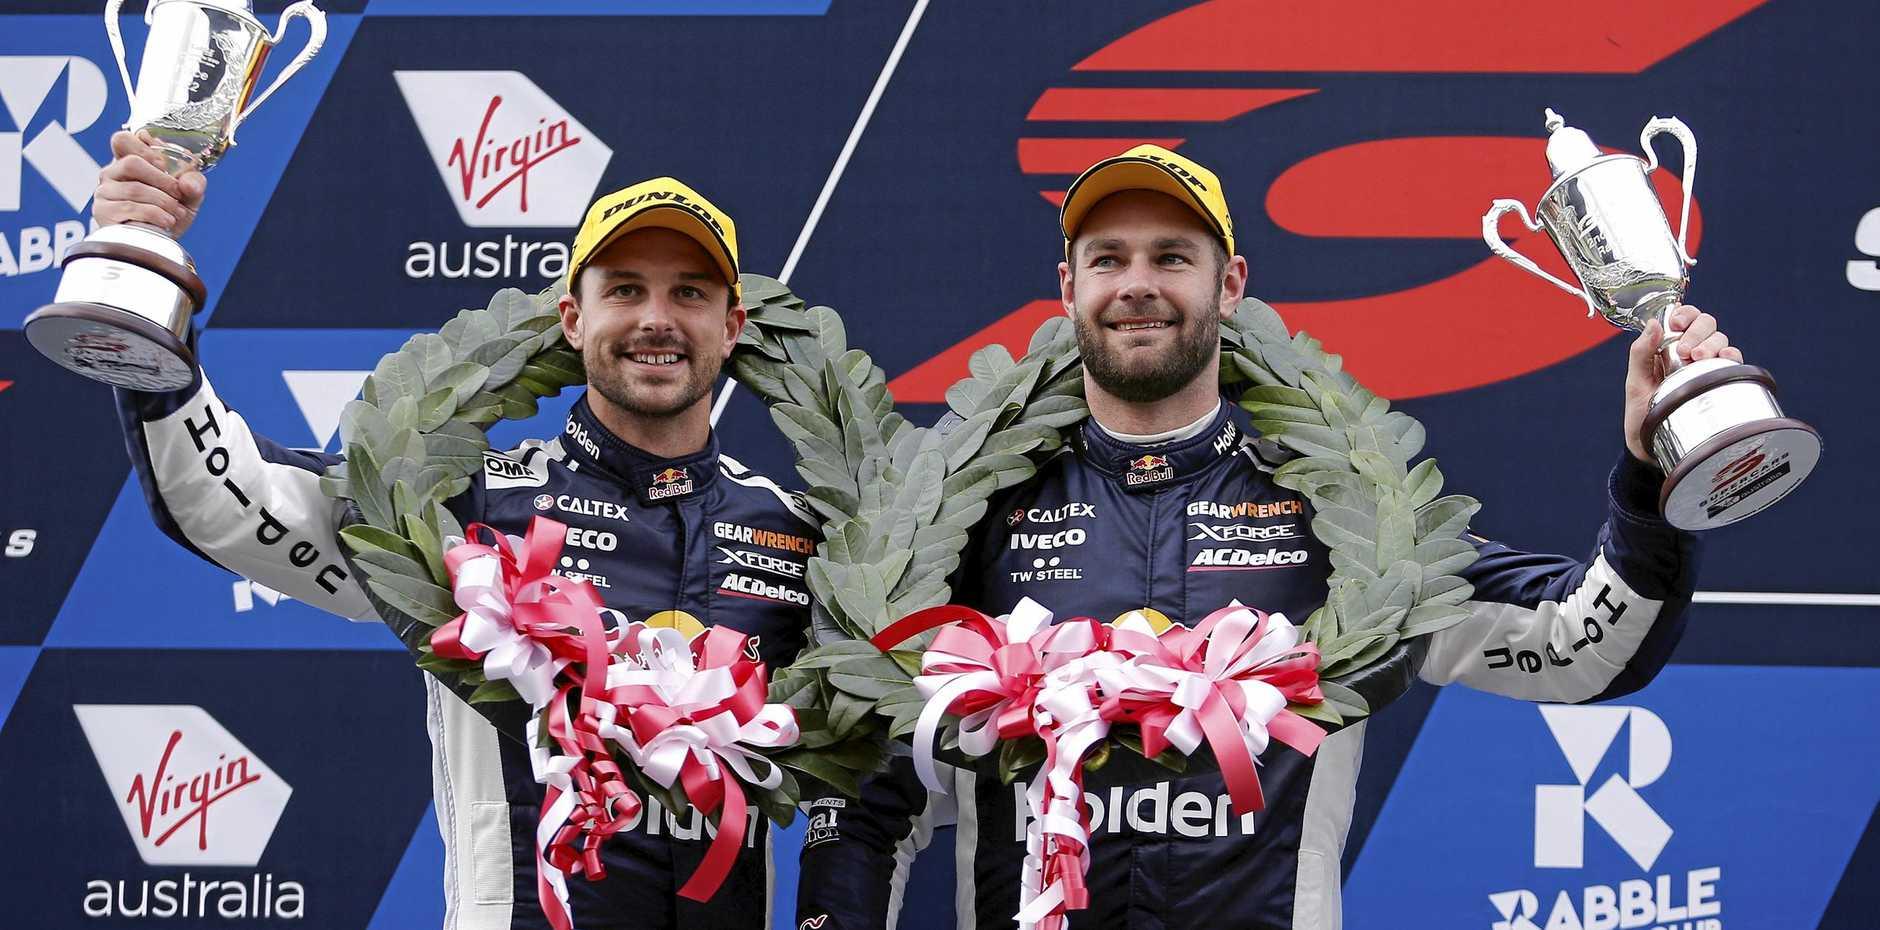 Red Bull Holden Racing Team's Earl Bamber and Shane van Gisbergen on the podium after finishing second in the Sandown 500 on September 16. Picture: Daniel Pockett/AAP